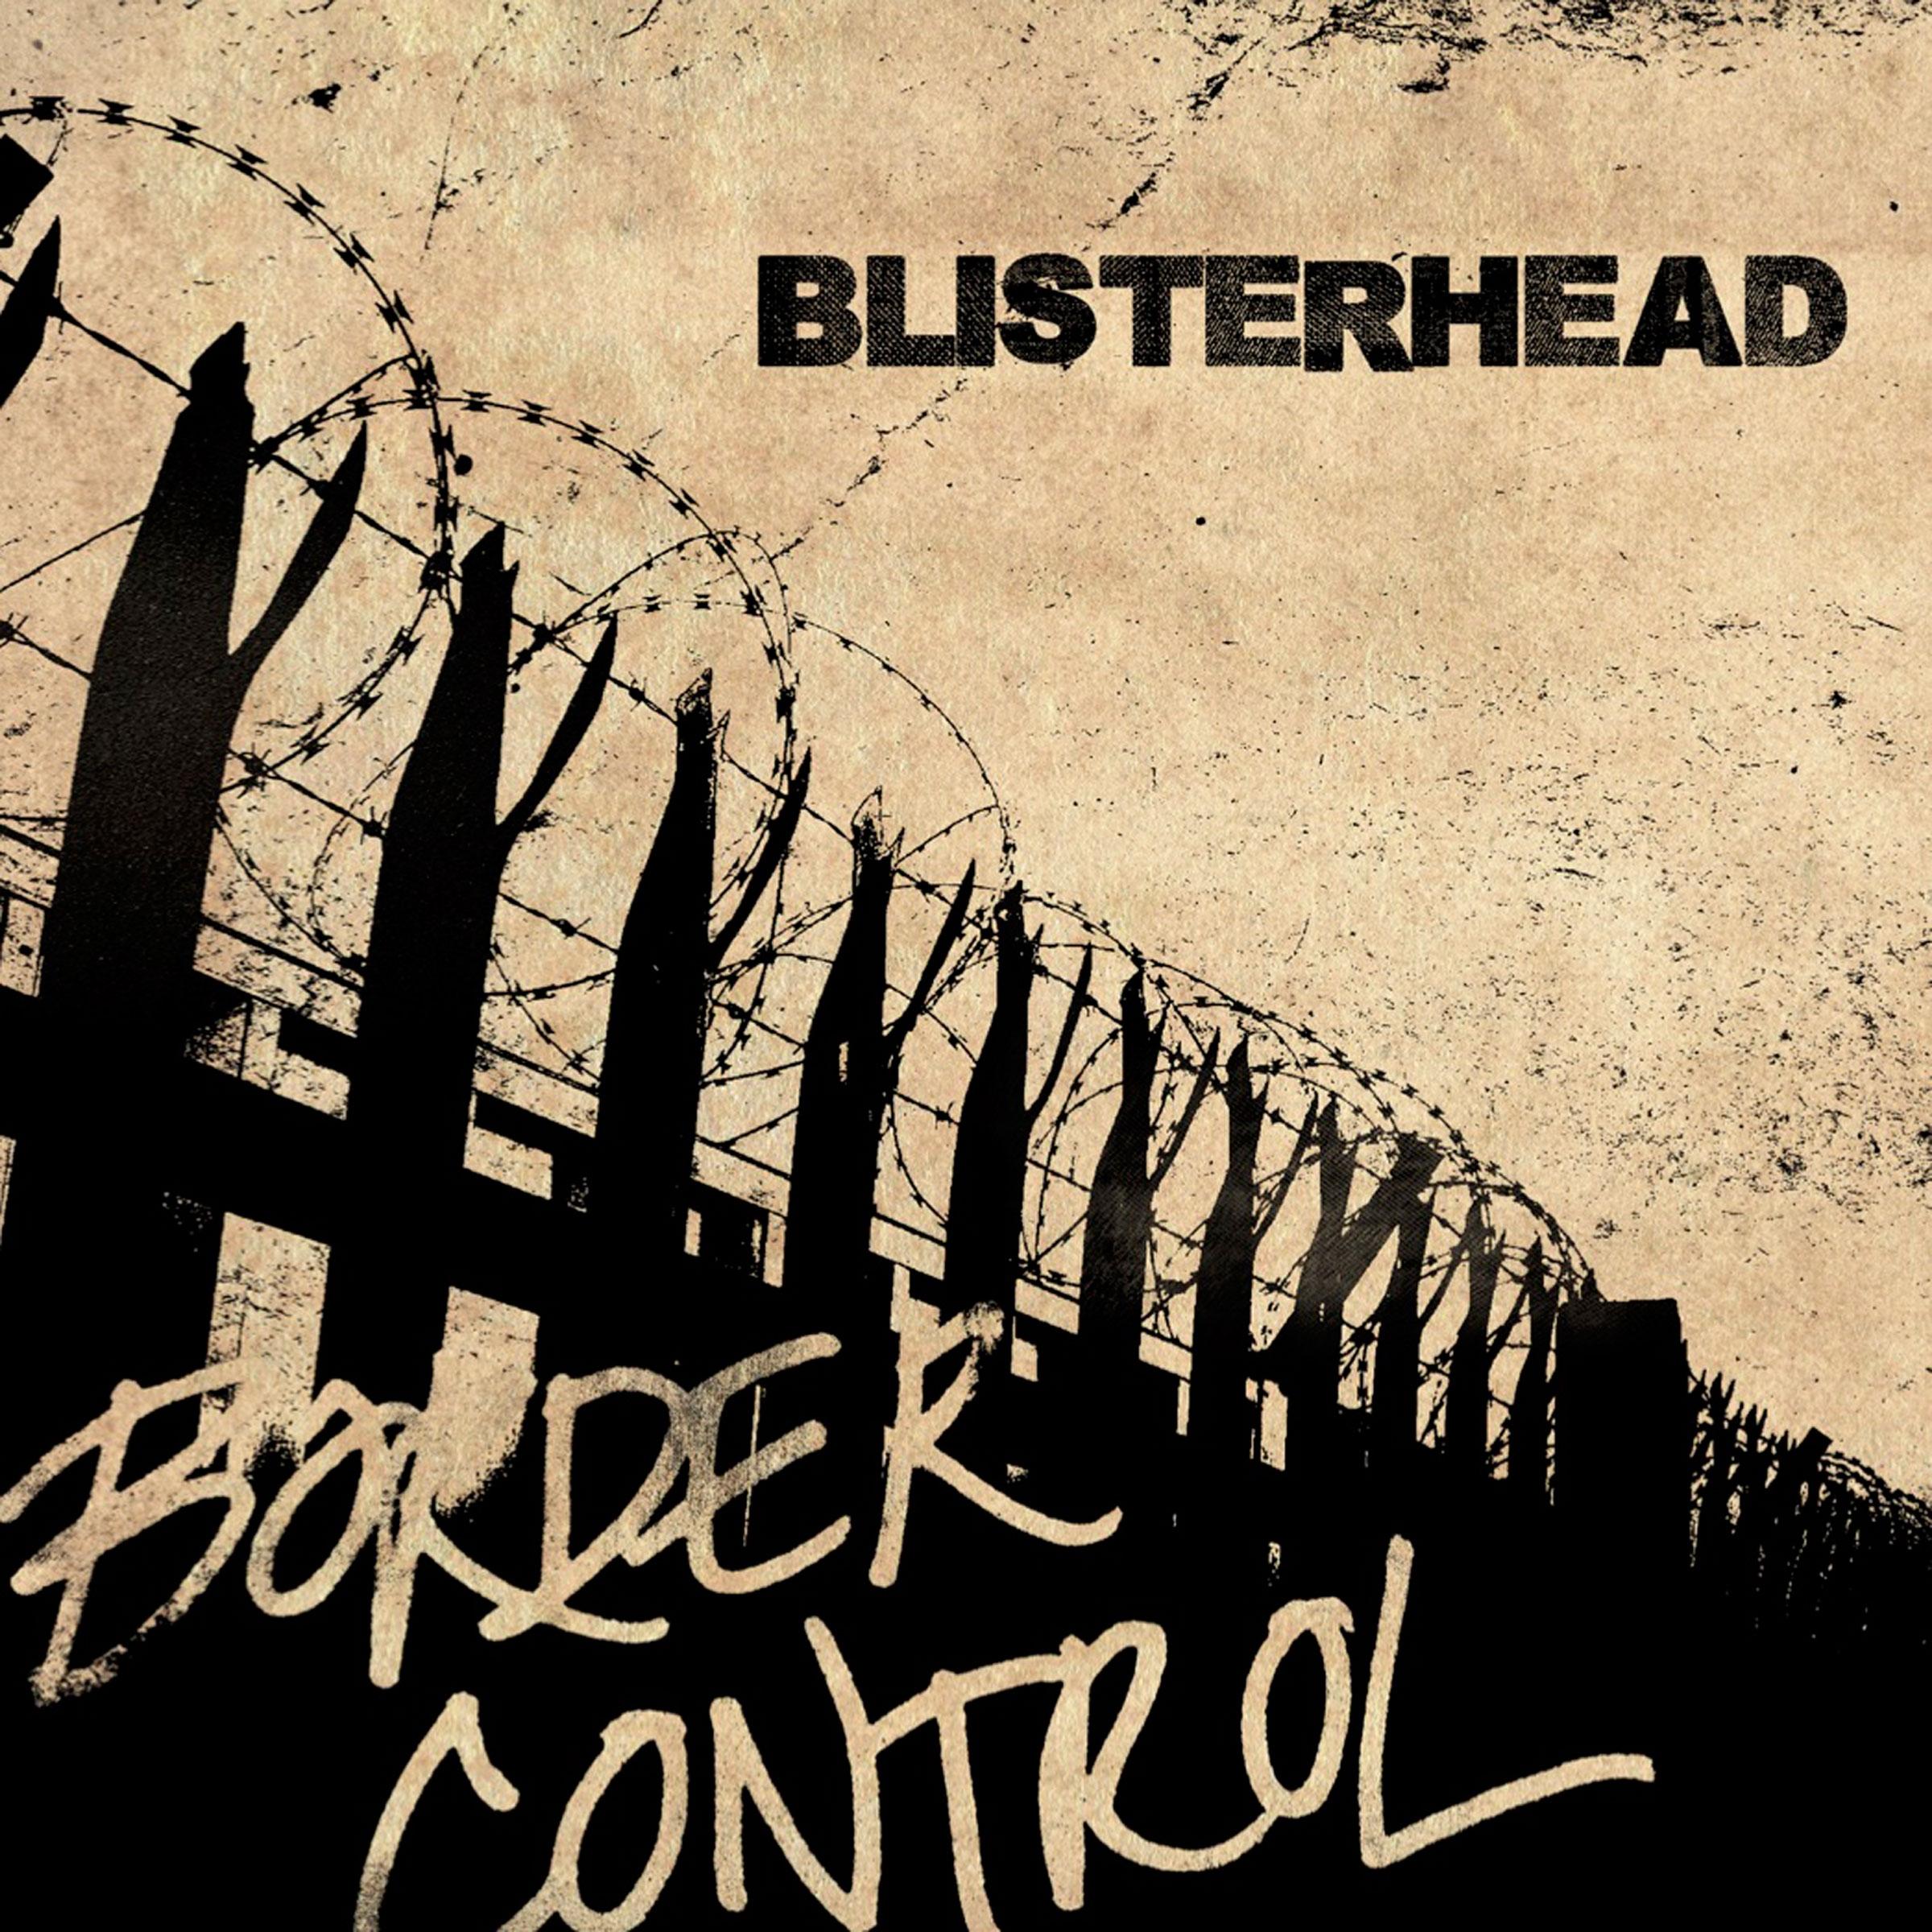 Blisterhead - Border Control - Artwork.jpg